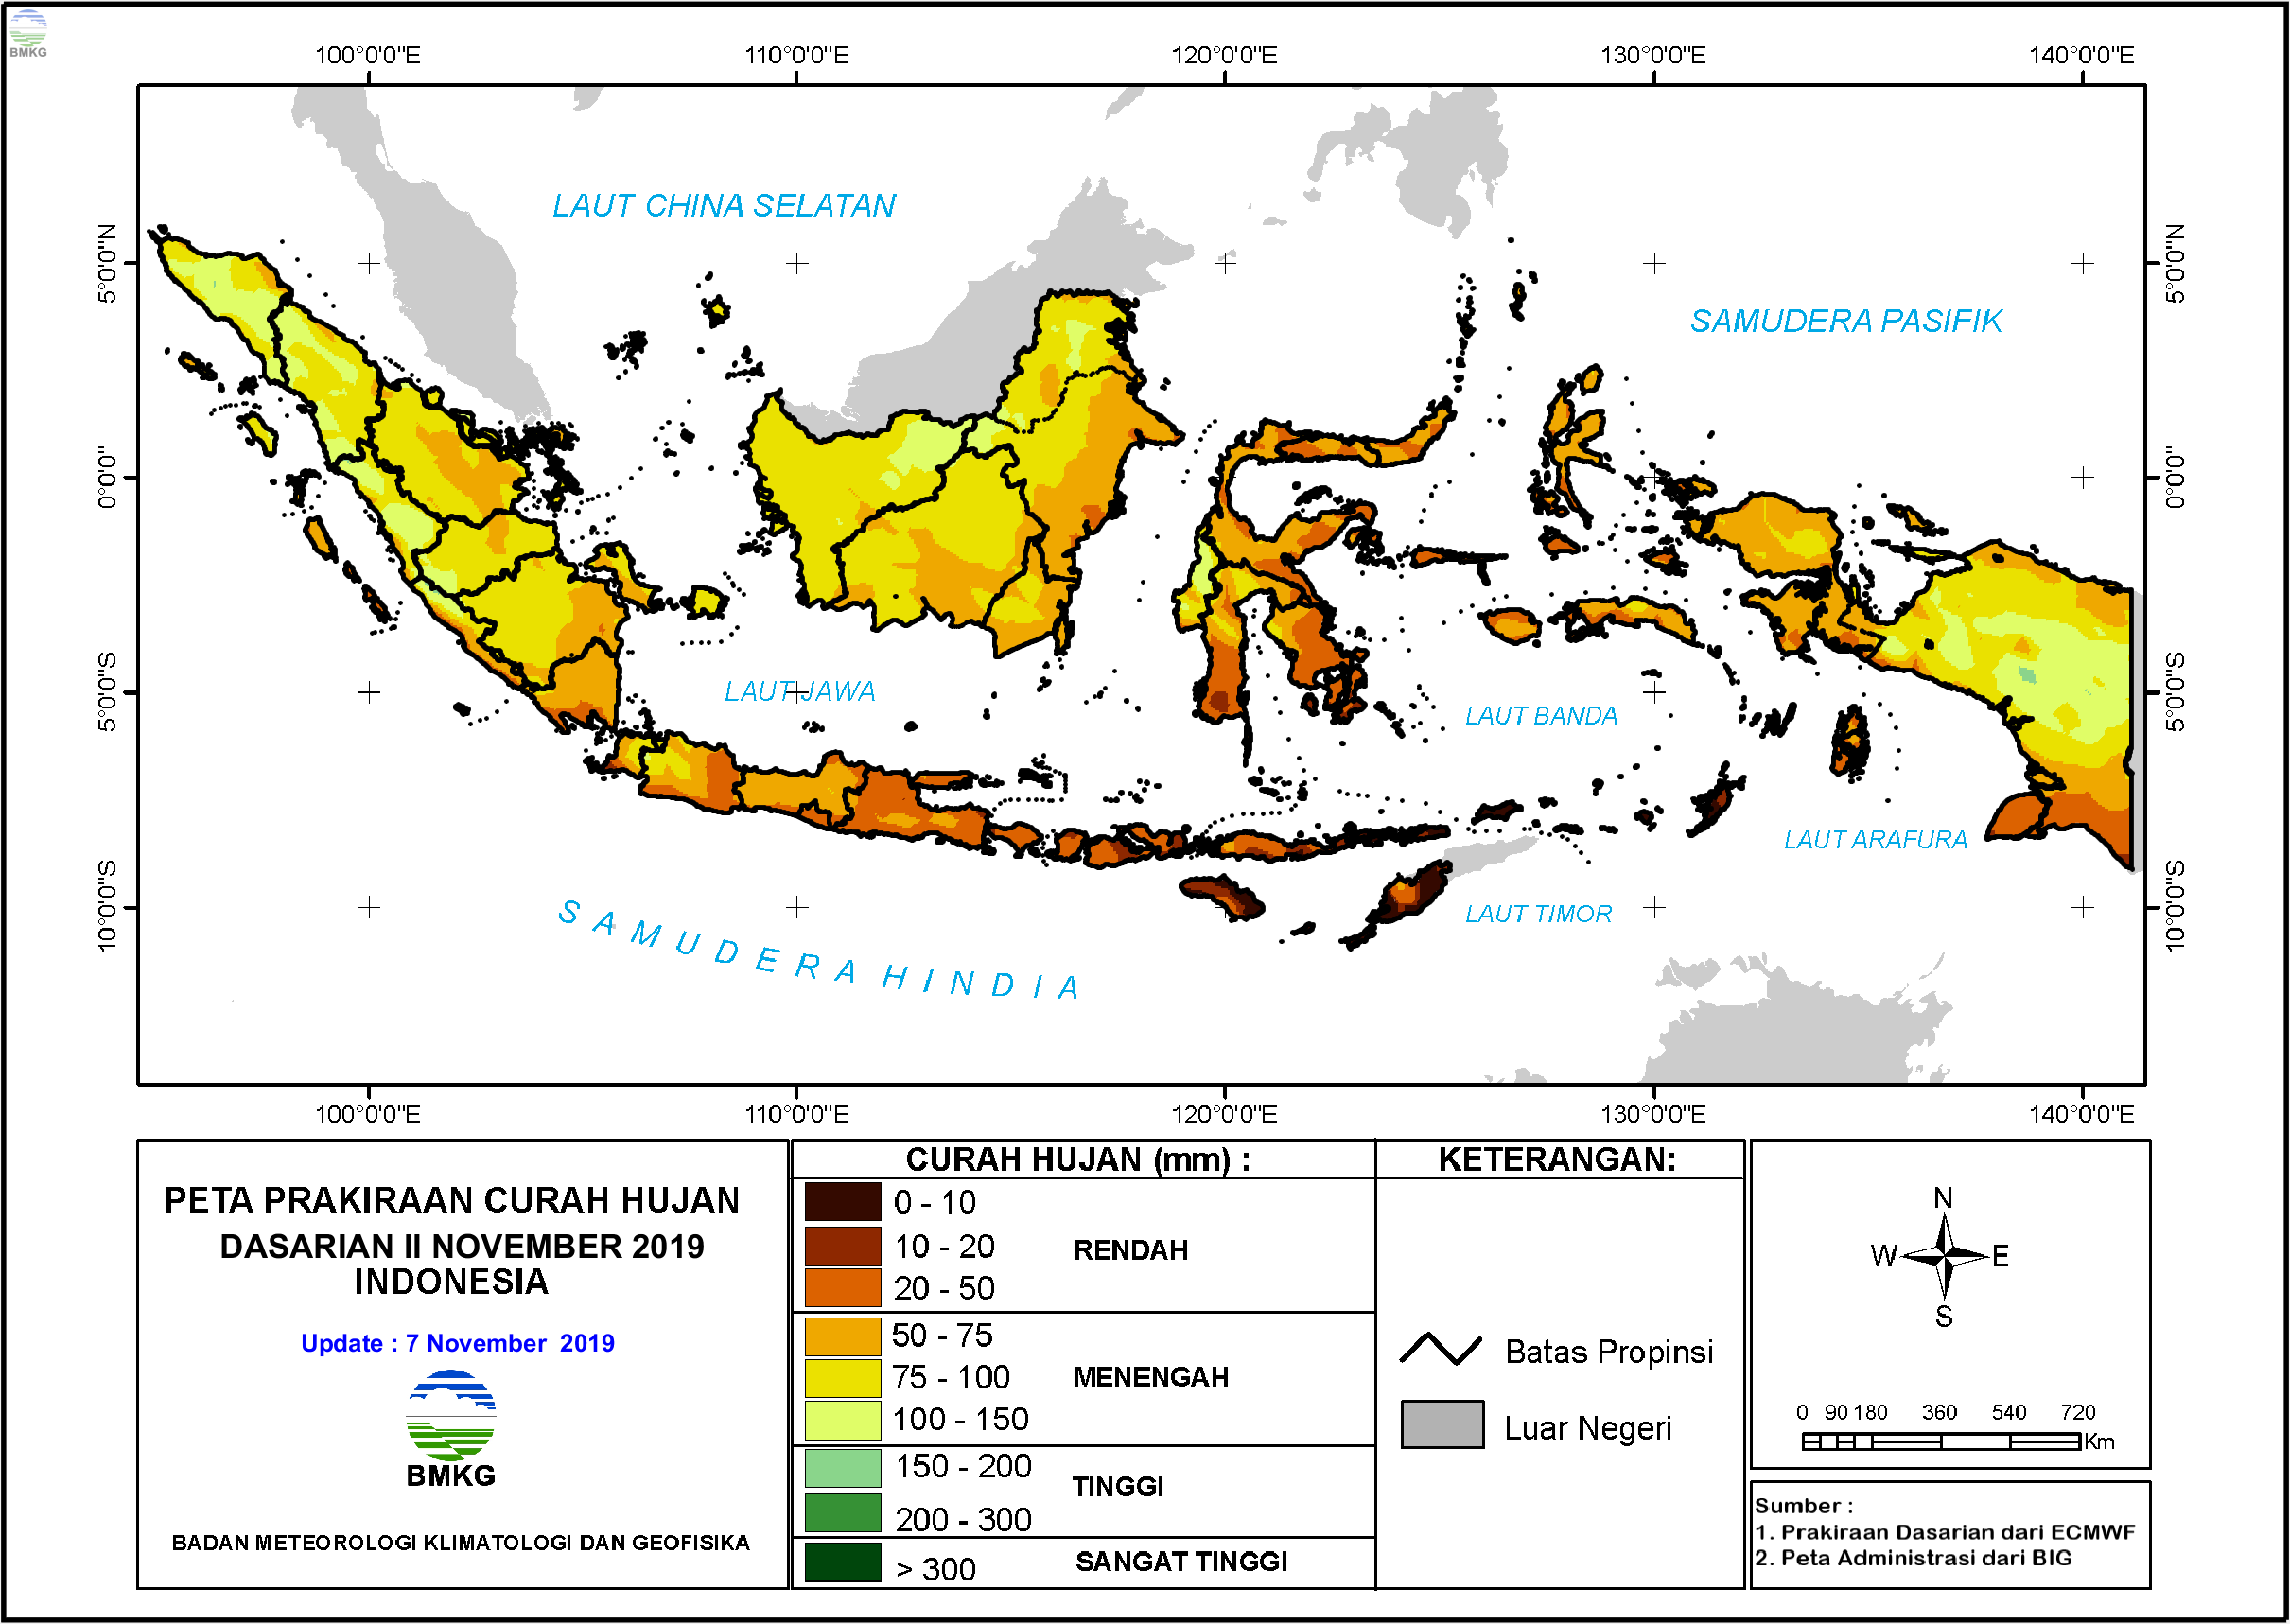 Prakiraan Hujan Dasarian II - III November dan I Desember 2019